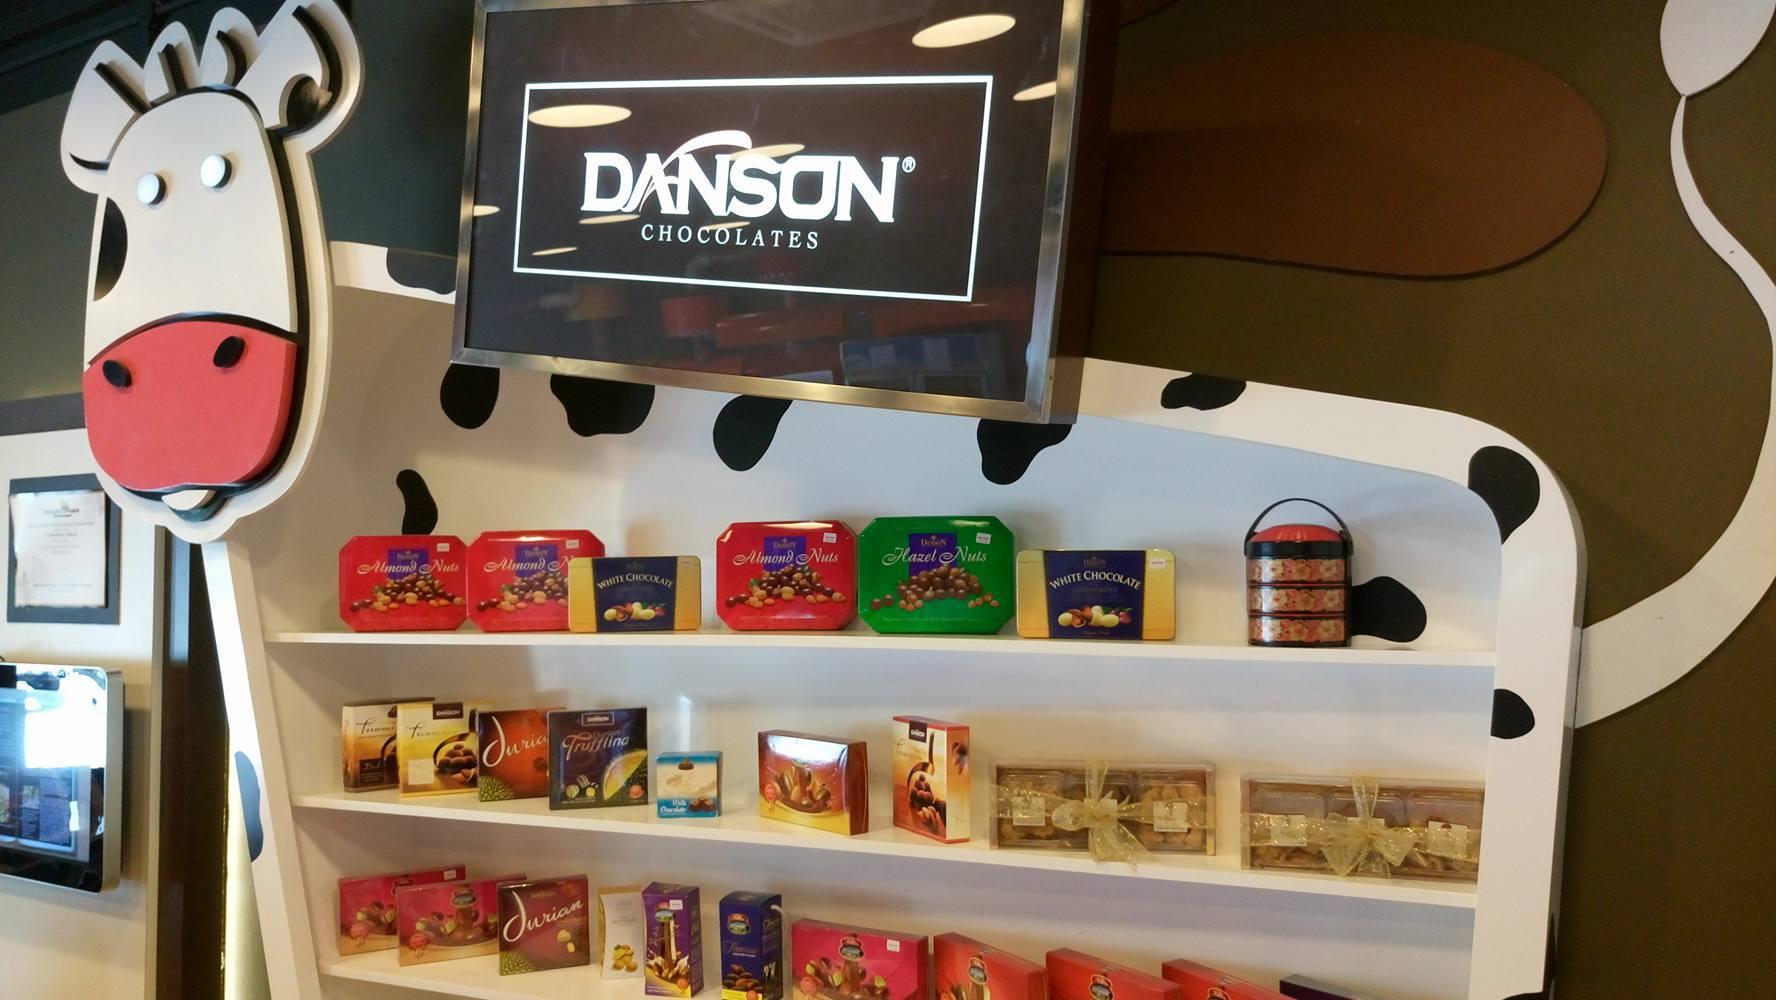 Danson Chocolates